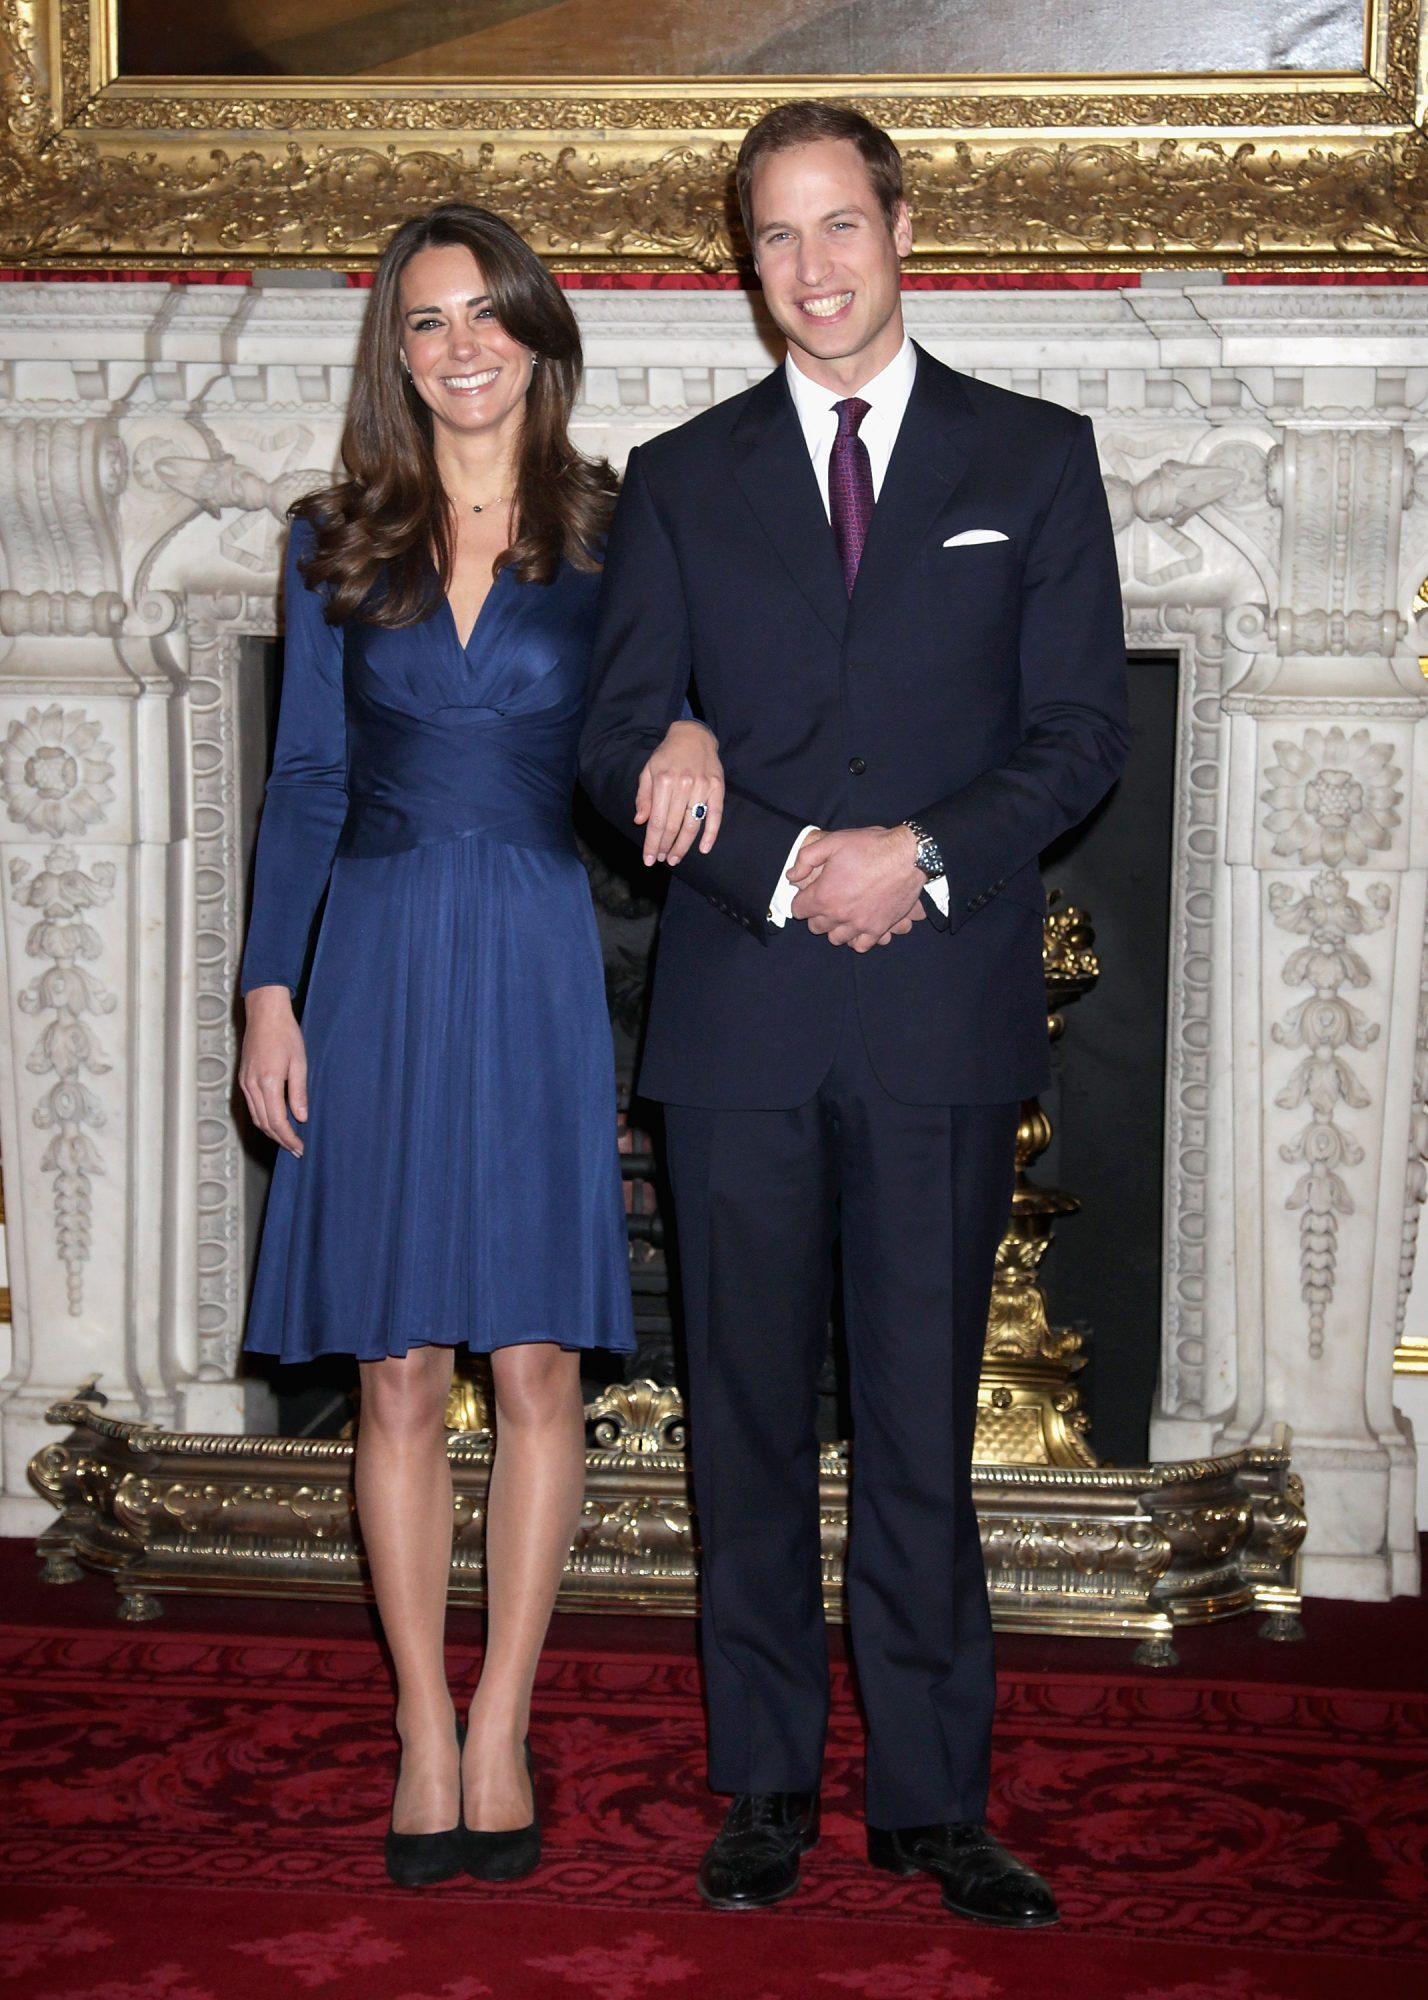 Kate Middleton, compromiso, vestido